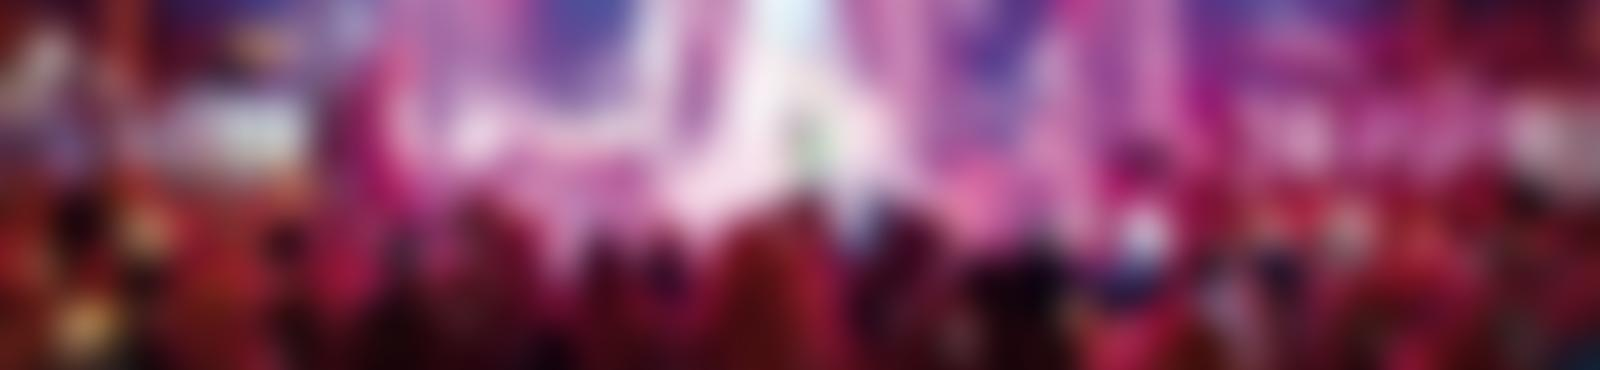 Blurred bar jeder vernunft berlin image